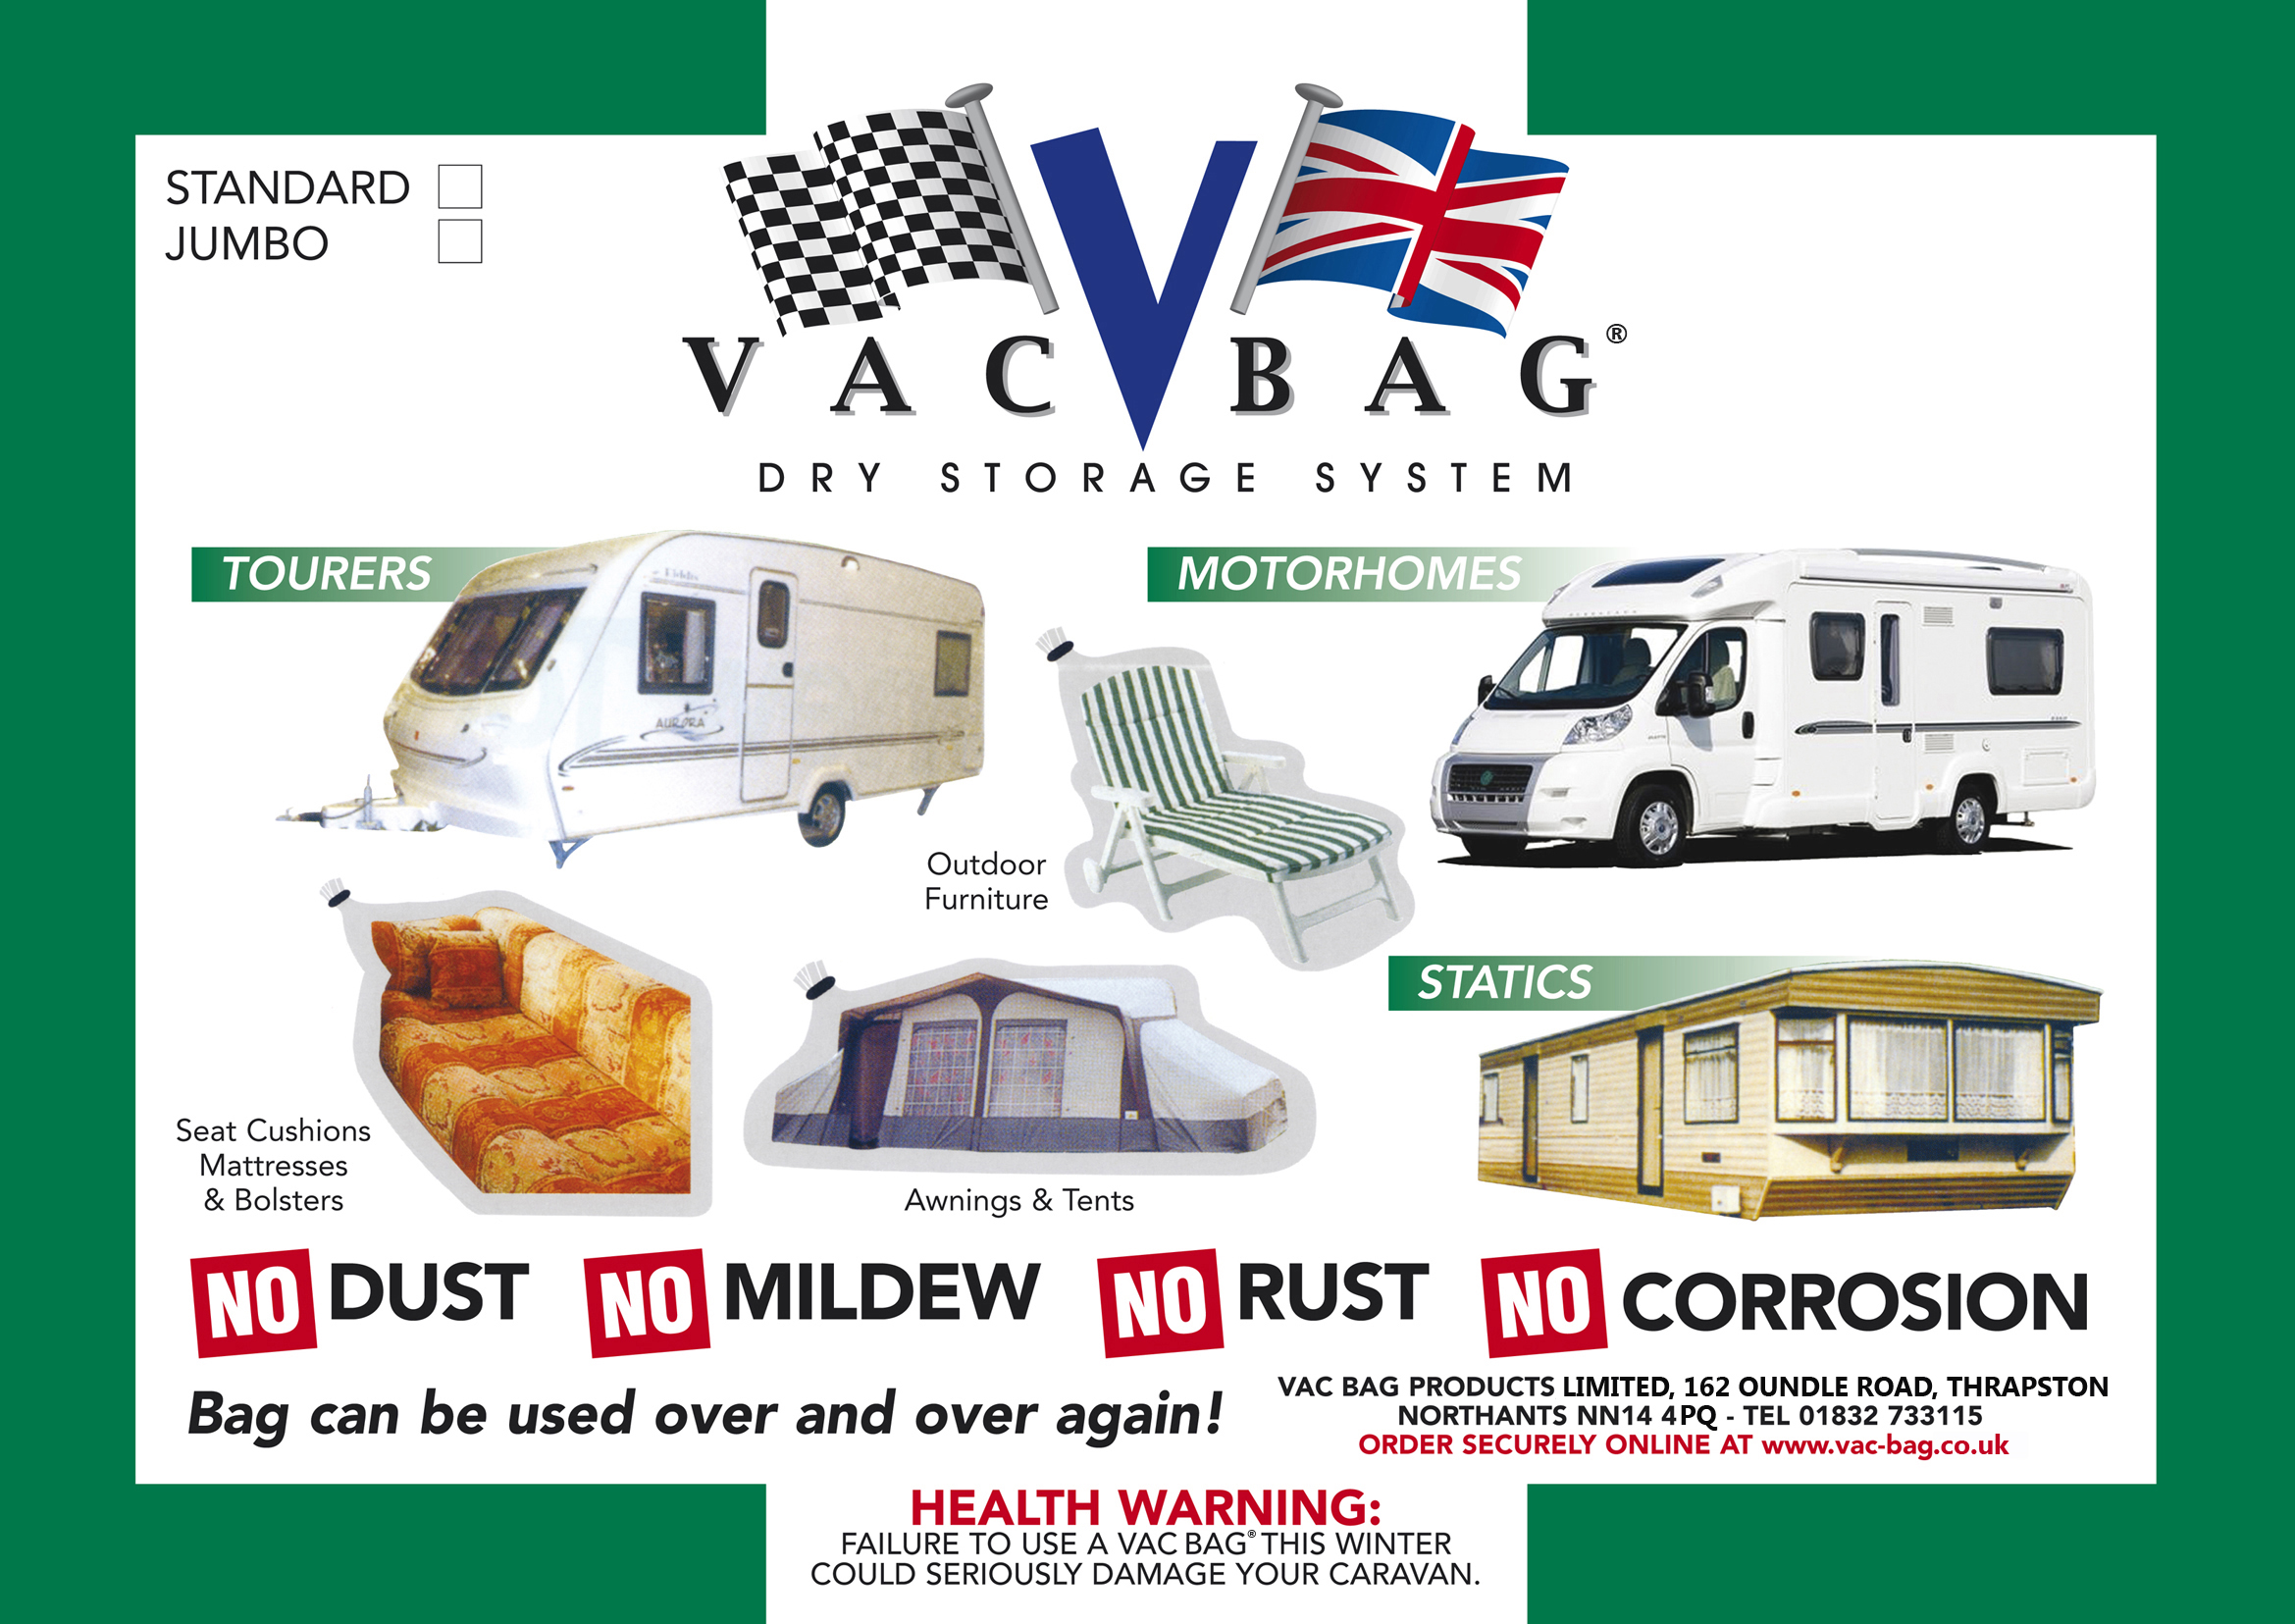 Caravan & Camping Vac Bag® Jumbo - Size 3 65m x 2 4m (12ft x